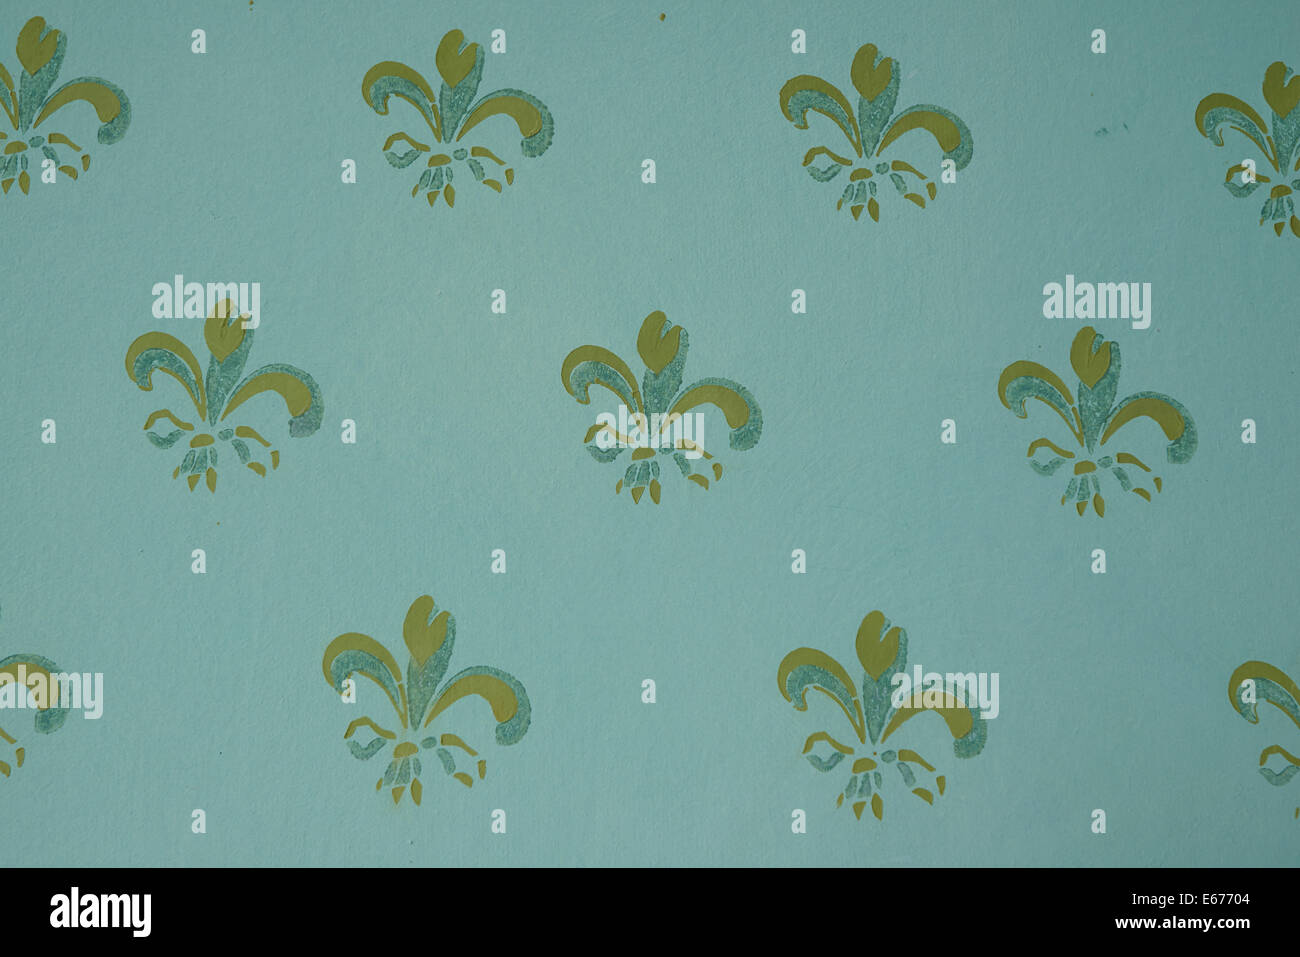 fleur de lis wallpaper stockfotos fleur de lis wallpaper. Black Bedroom Furniture Sets. Home Design Ideas